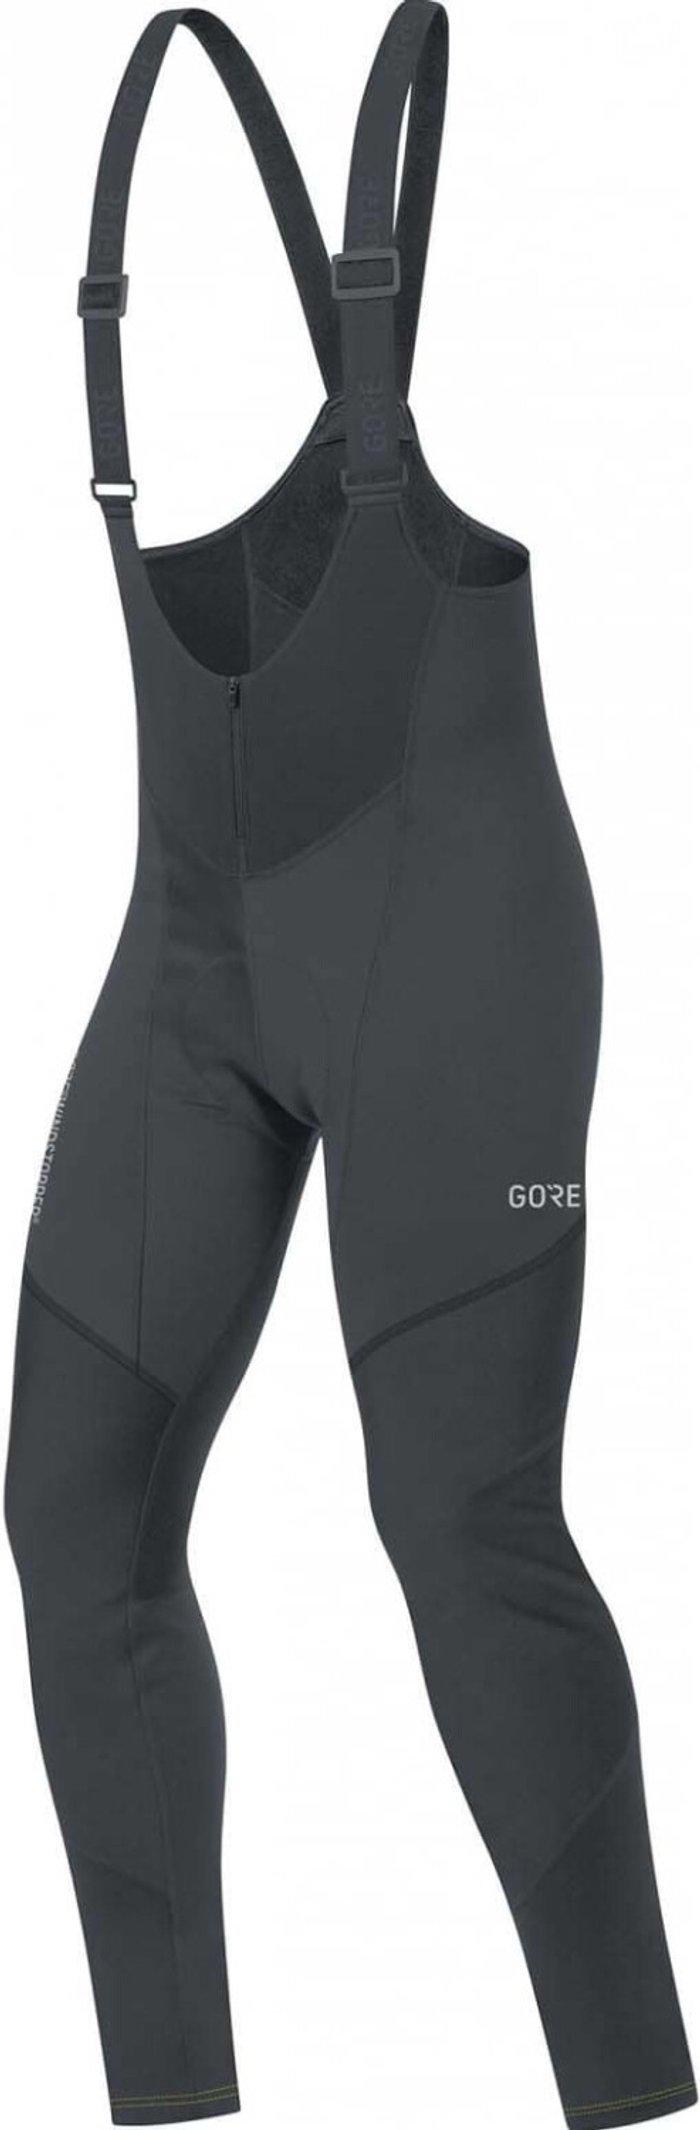 GORE Gore C3 Windstopper Thermo Bib Shorts Men black